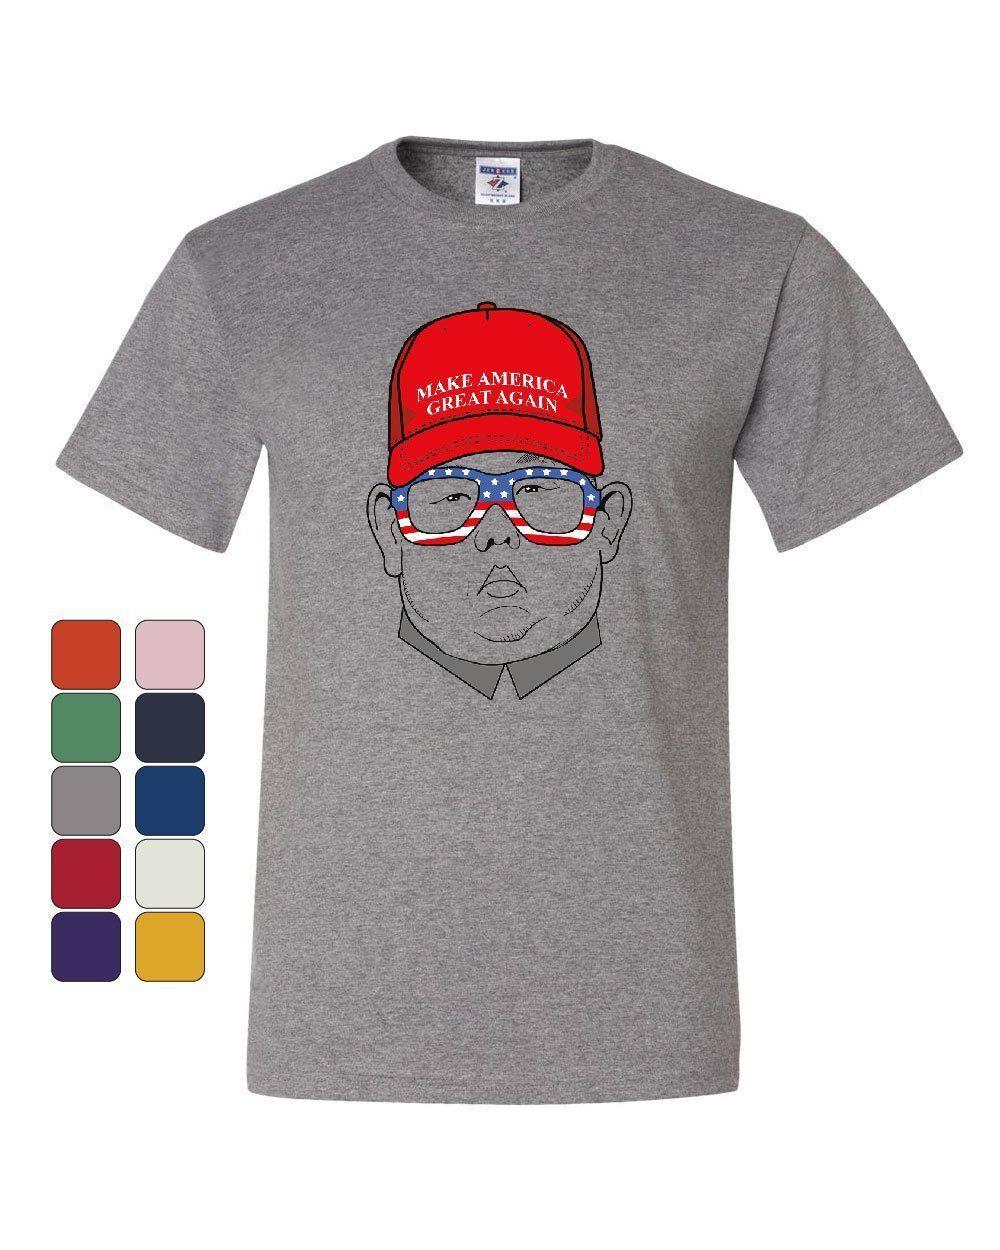 2ff589d7d MAGA Hat Kim Jong Un T Shirt Funny North Korea USA Donald Trump Tee Shirt  Harajuku Summer 2018 Tshirt Funny Ts T Shirts Buy From Lookcup, $16.24|  DHgate.Com